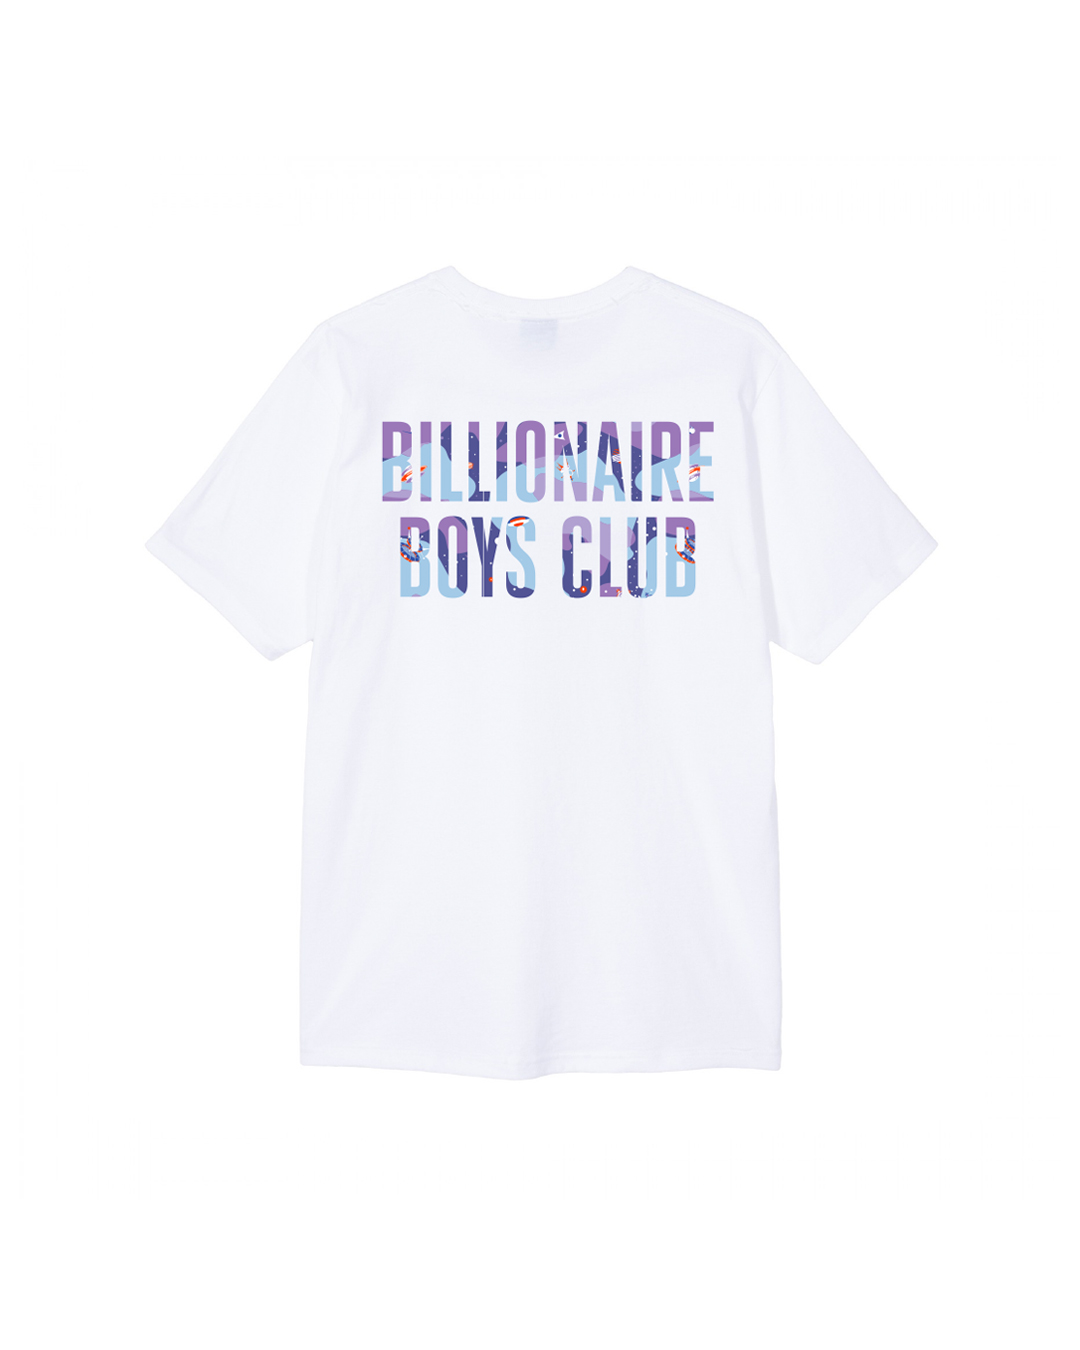 Billionaire Boys Club x HALO